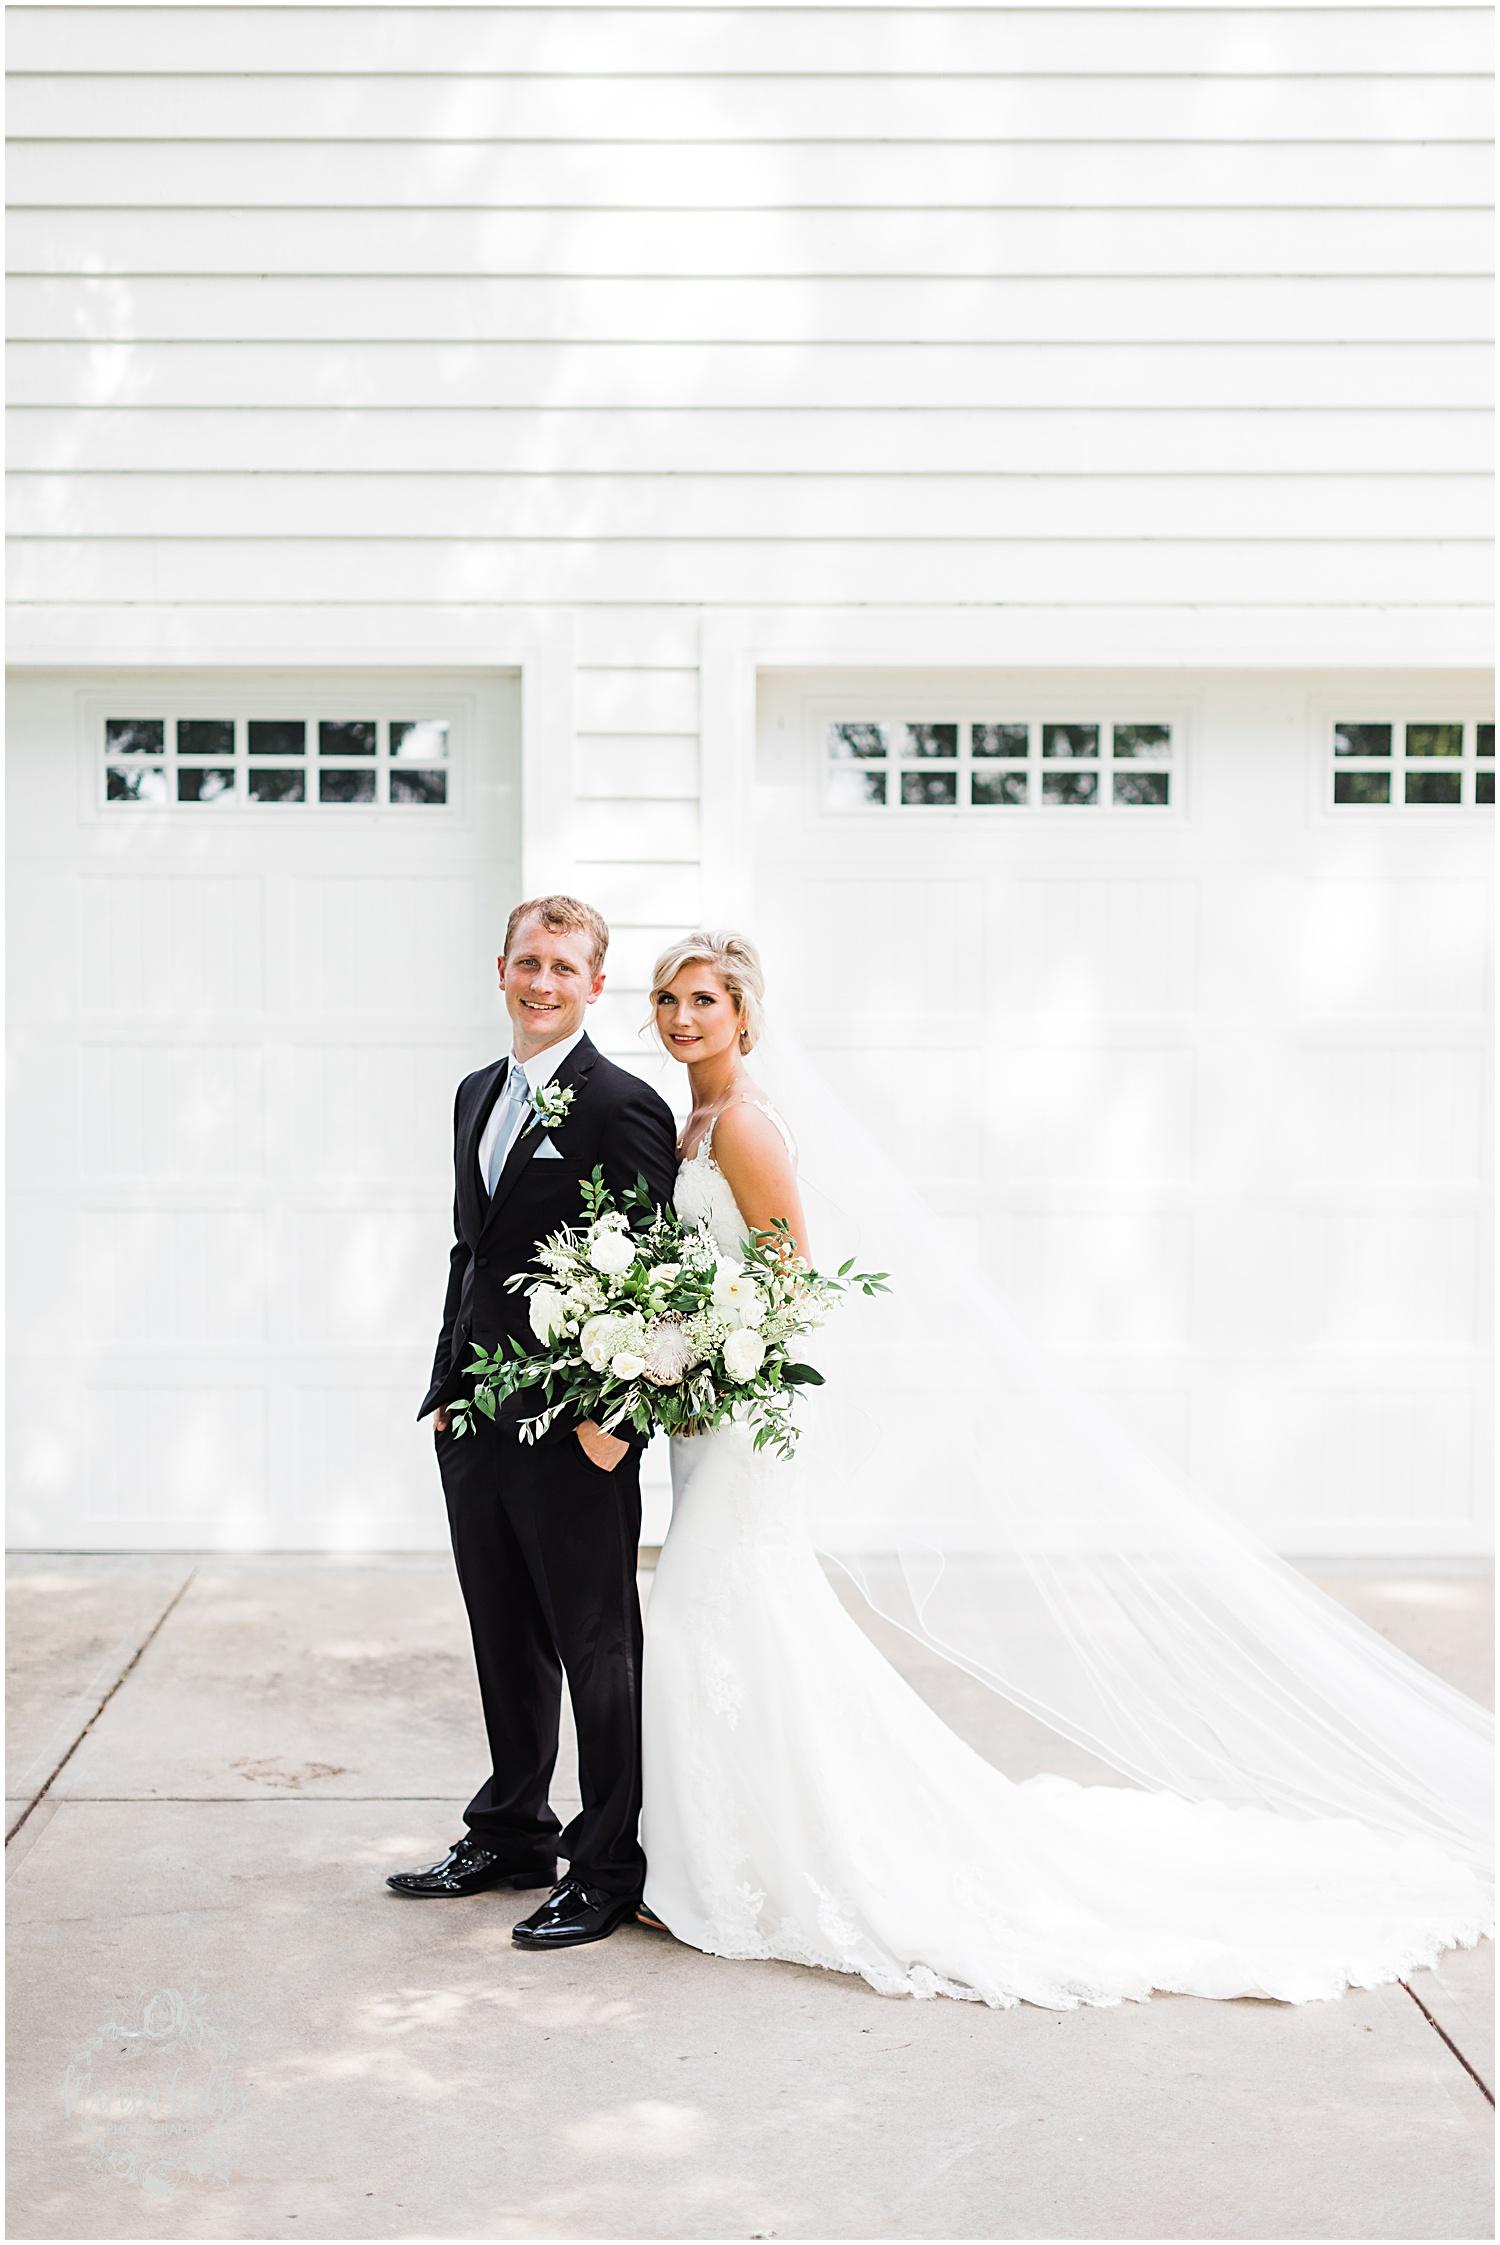 CHELSEA & BEN MARRIED BLOG  | MARISSA CRIBBS PHOTOGRAPHY_8571.jpg